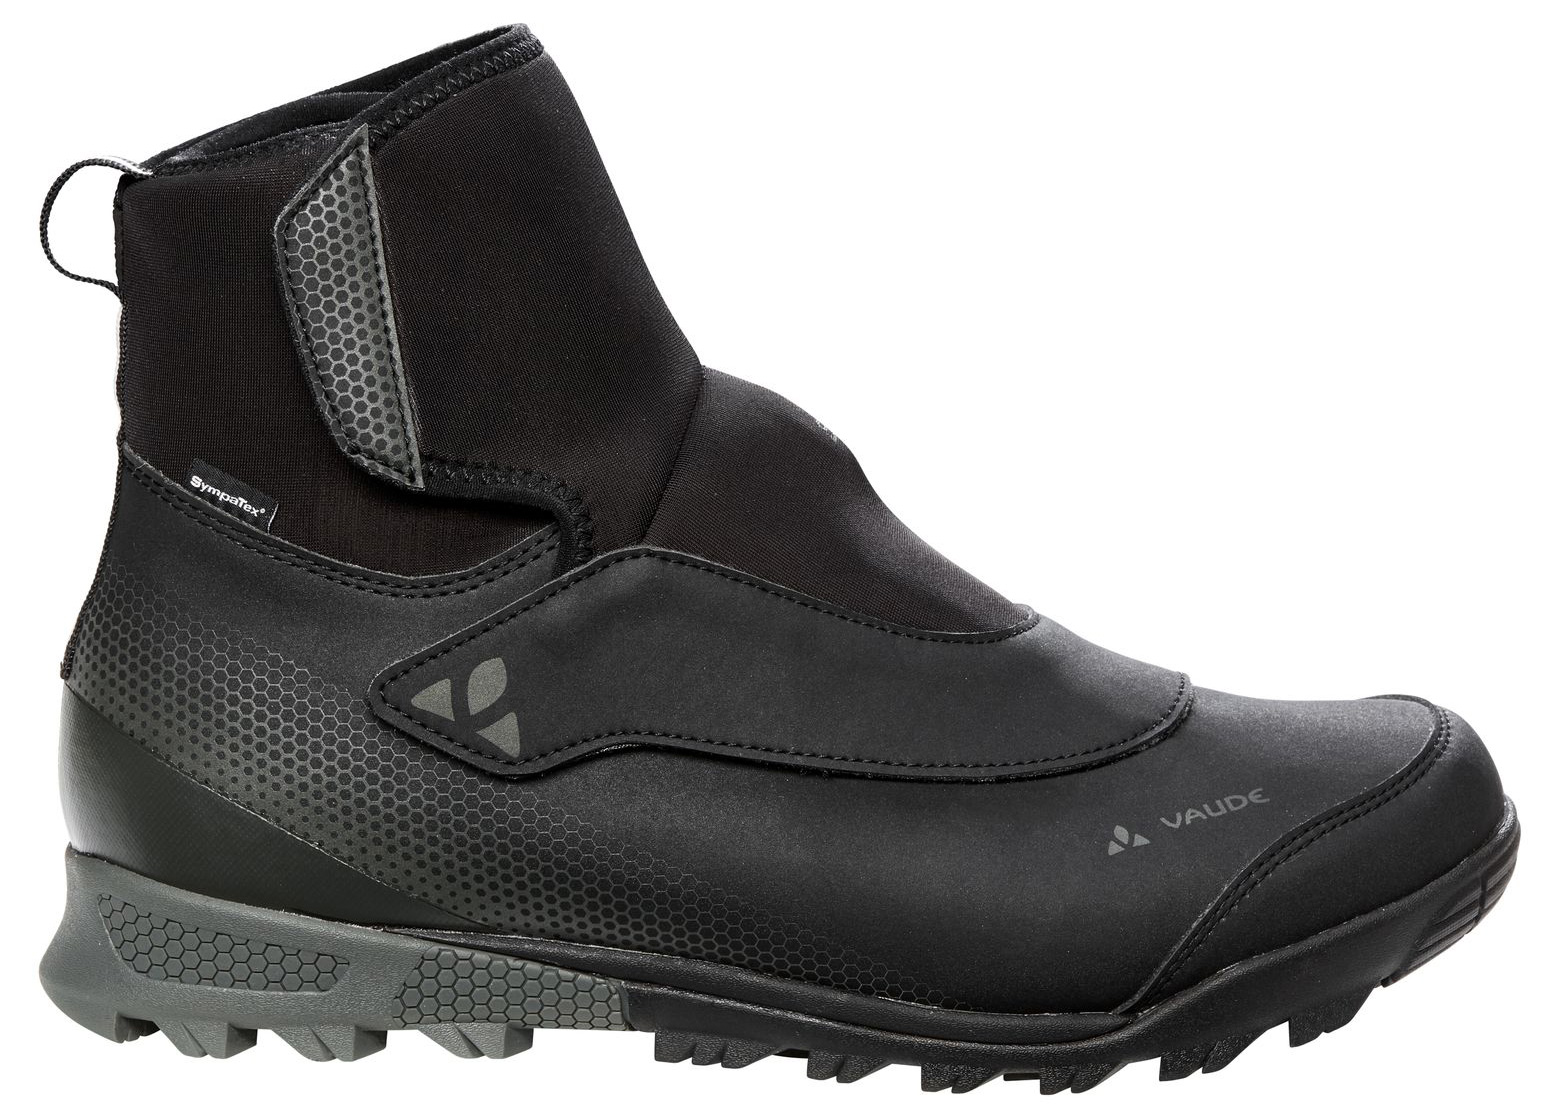 Vaude Minaki Mid II STX Shoes - black